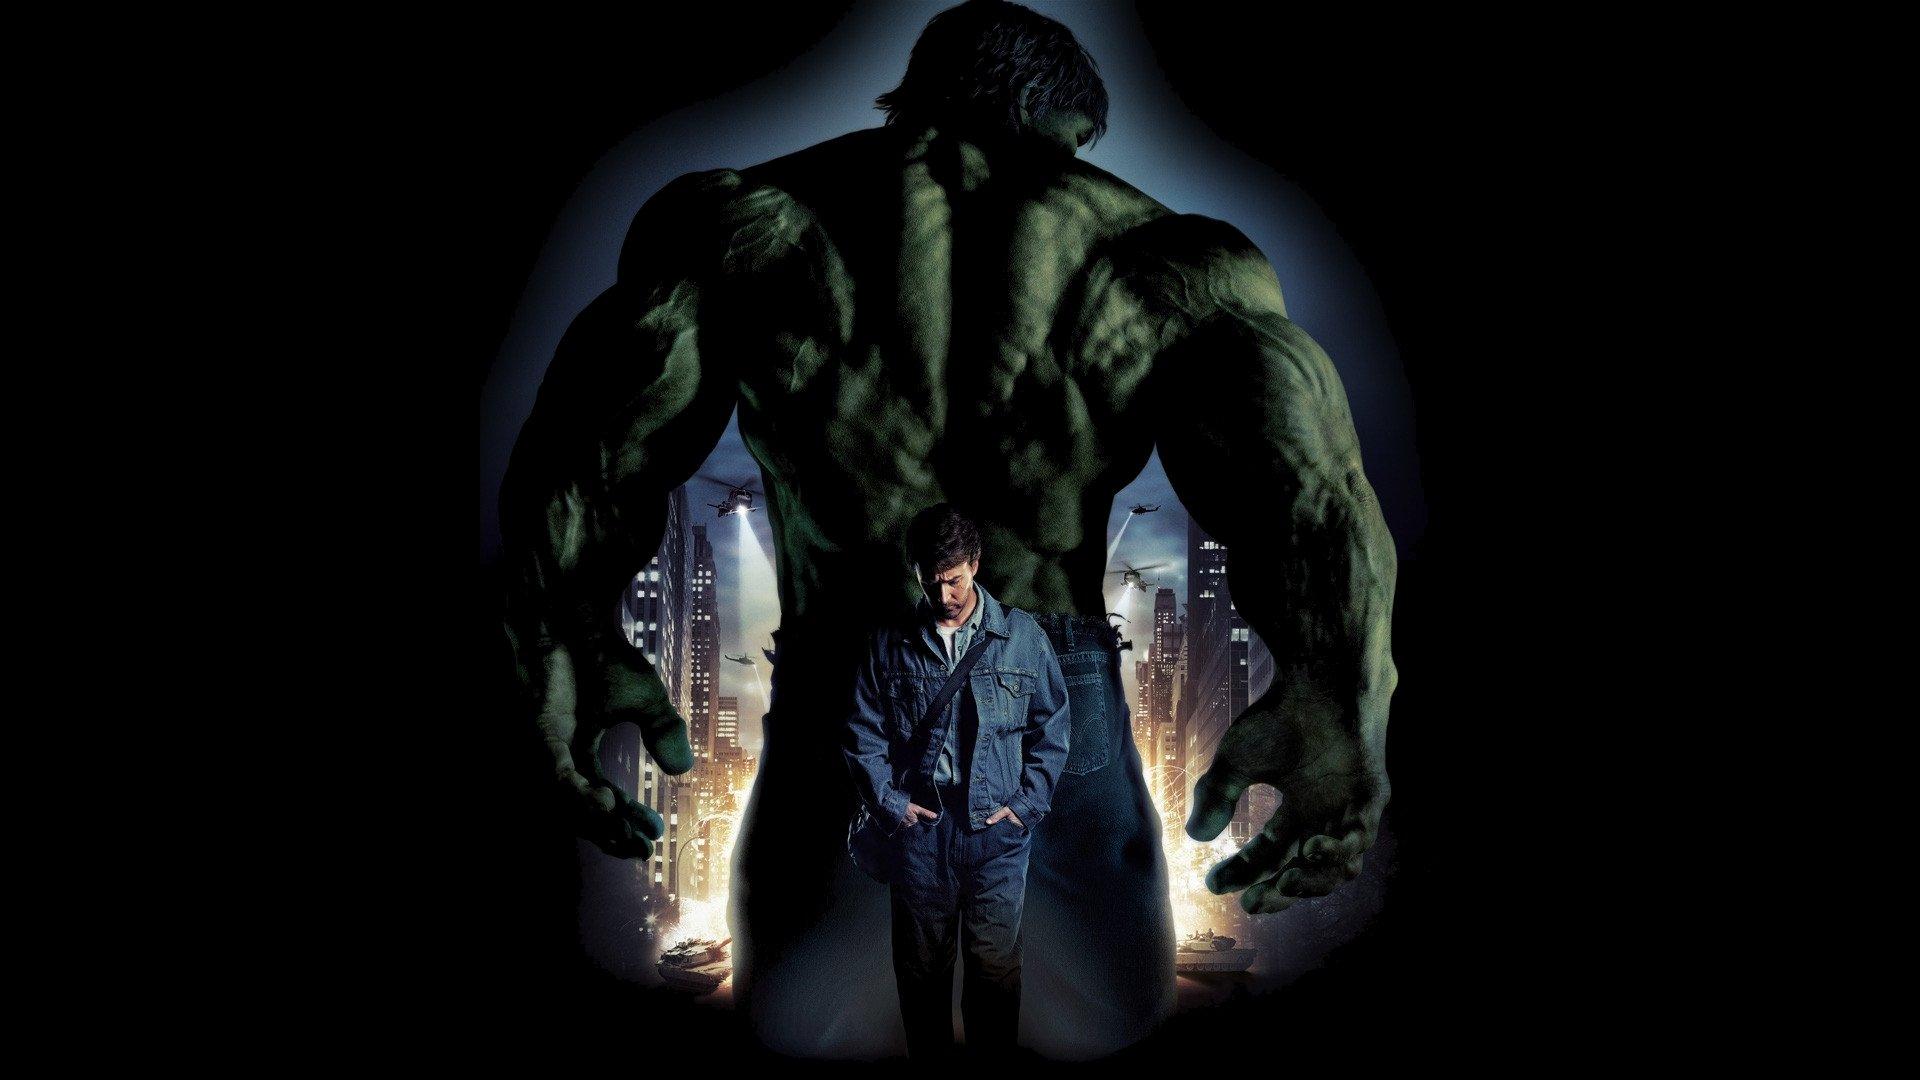 The Incredible Hulk Wallpaper Image Group 40 1920x1080